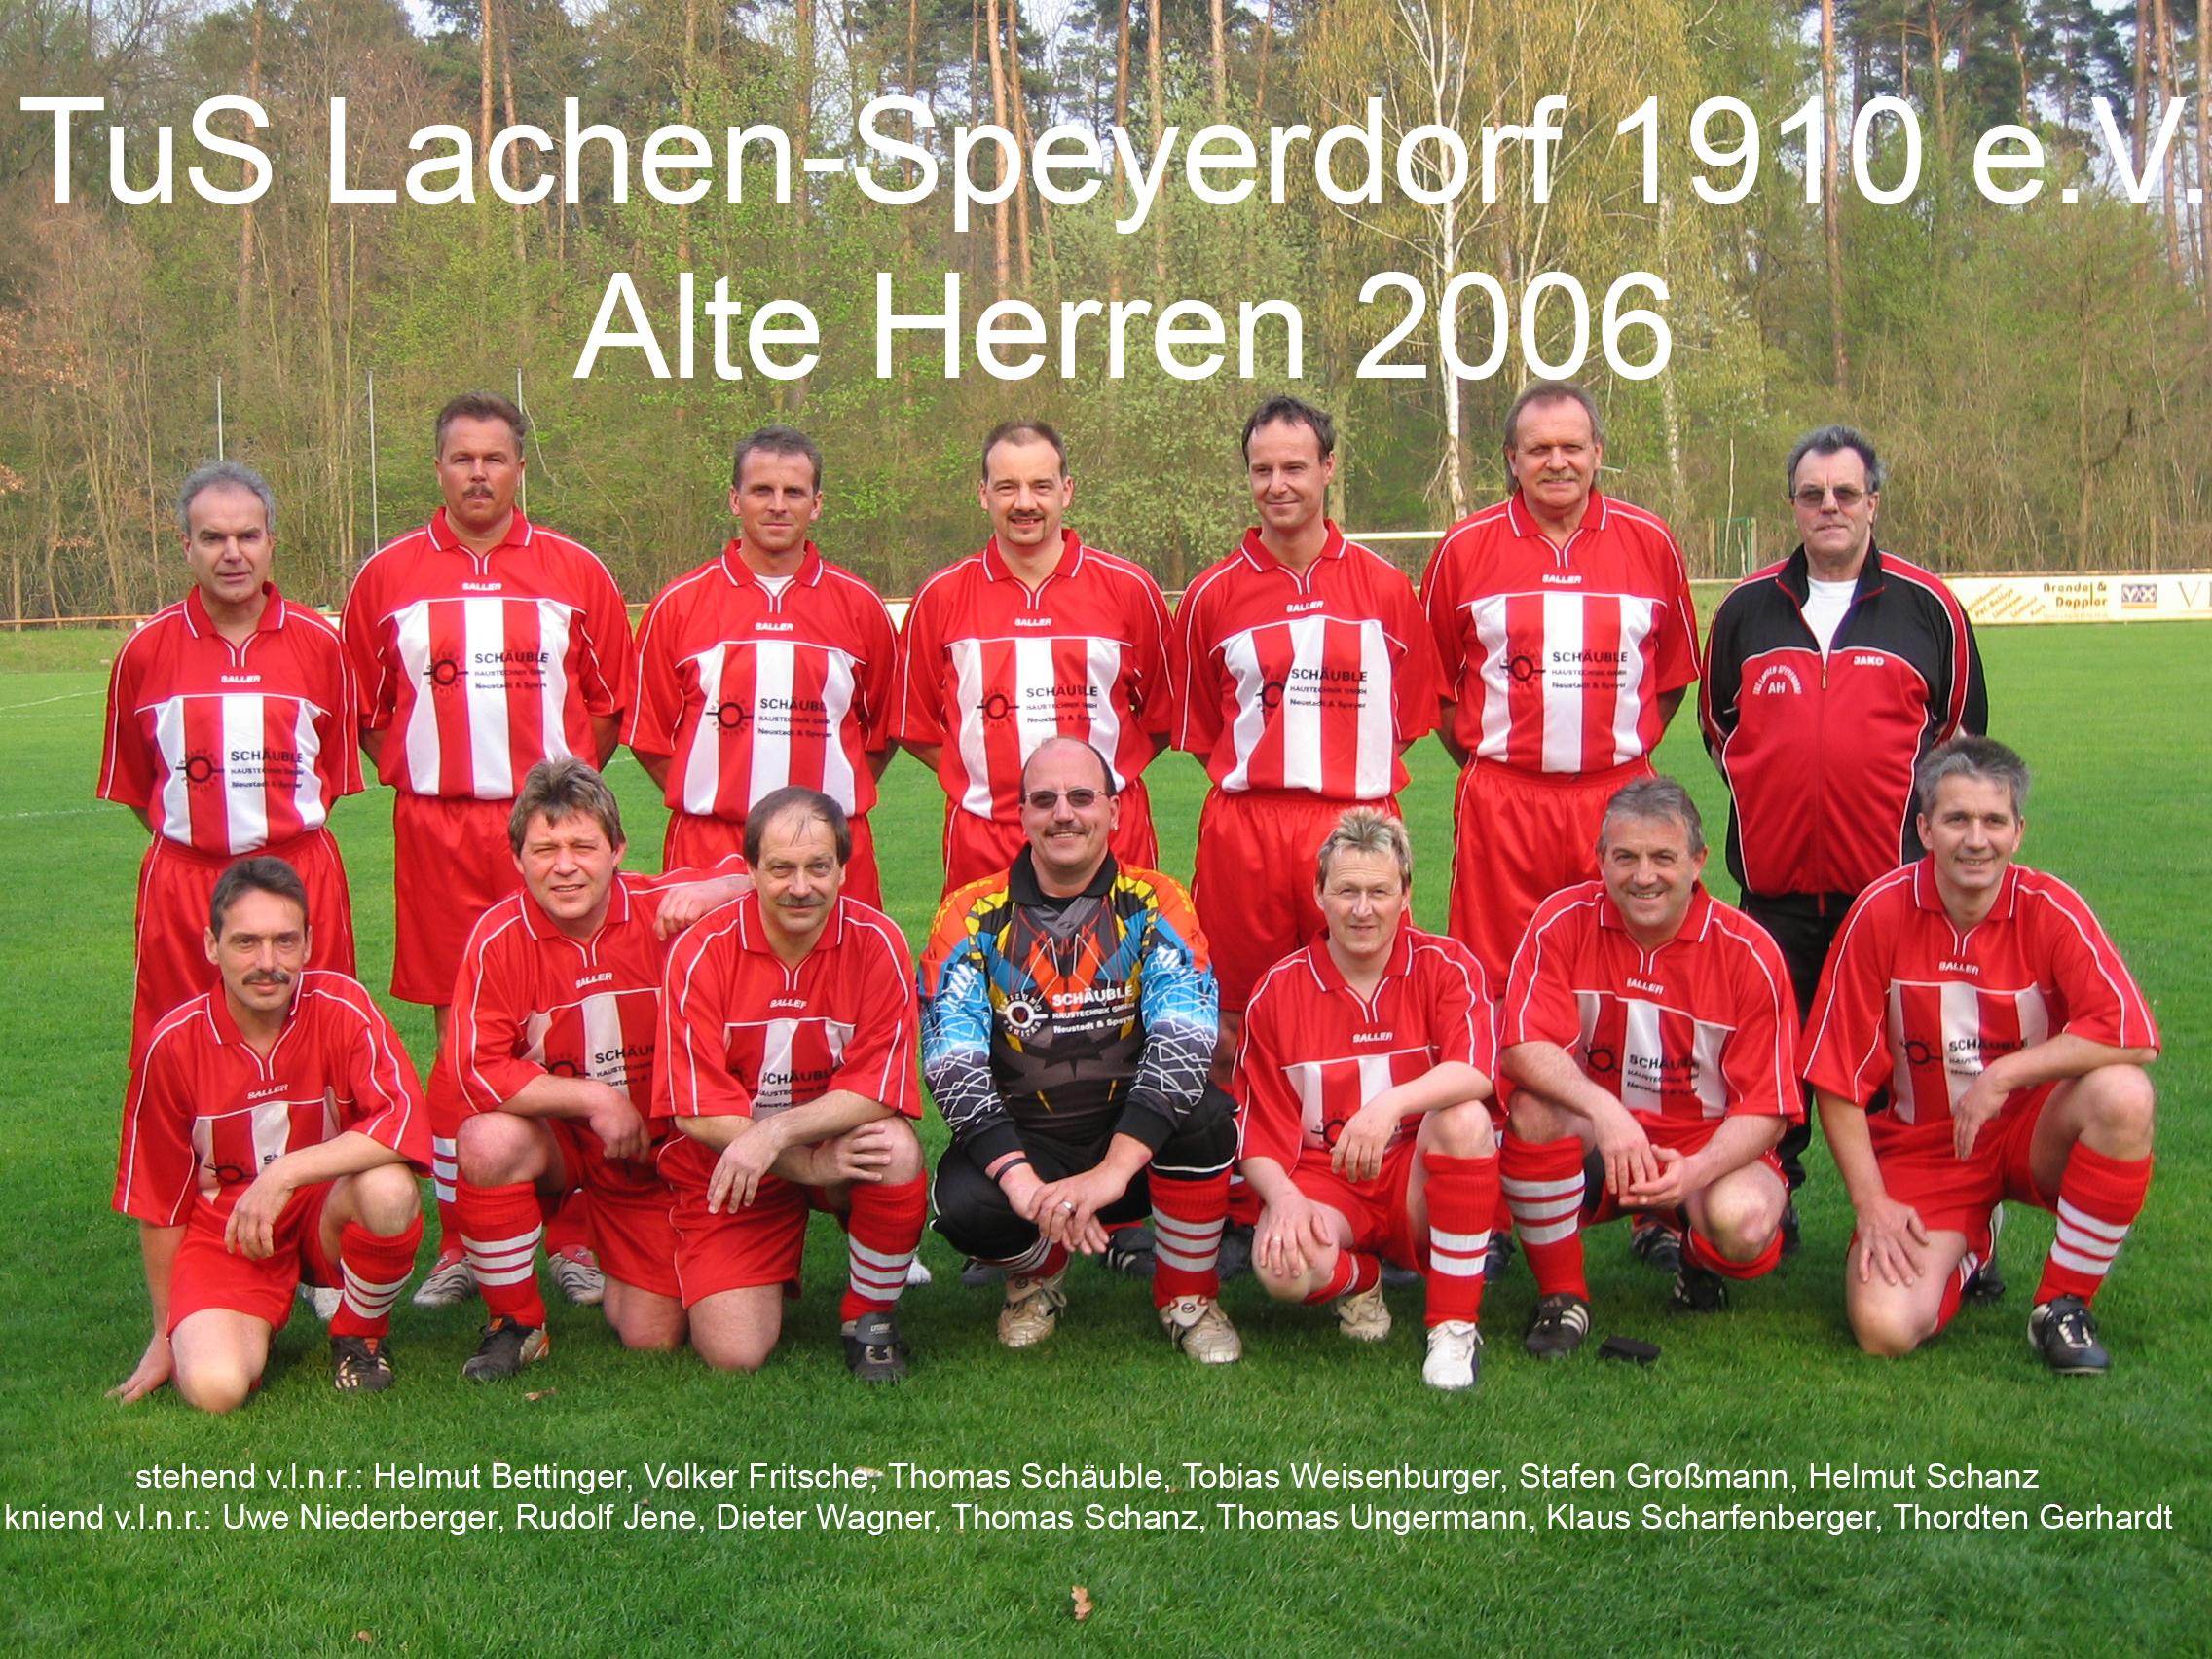 Tus Lachen Speyerdorf